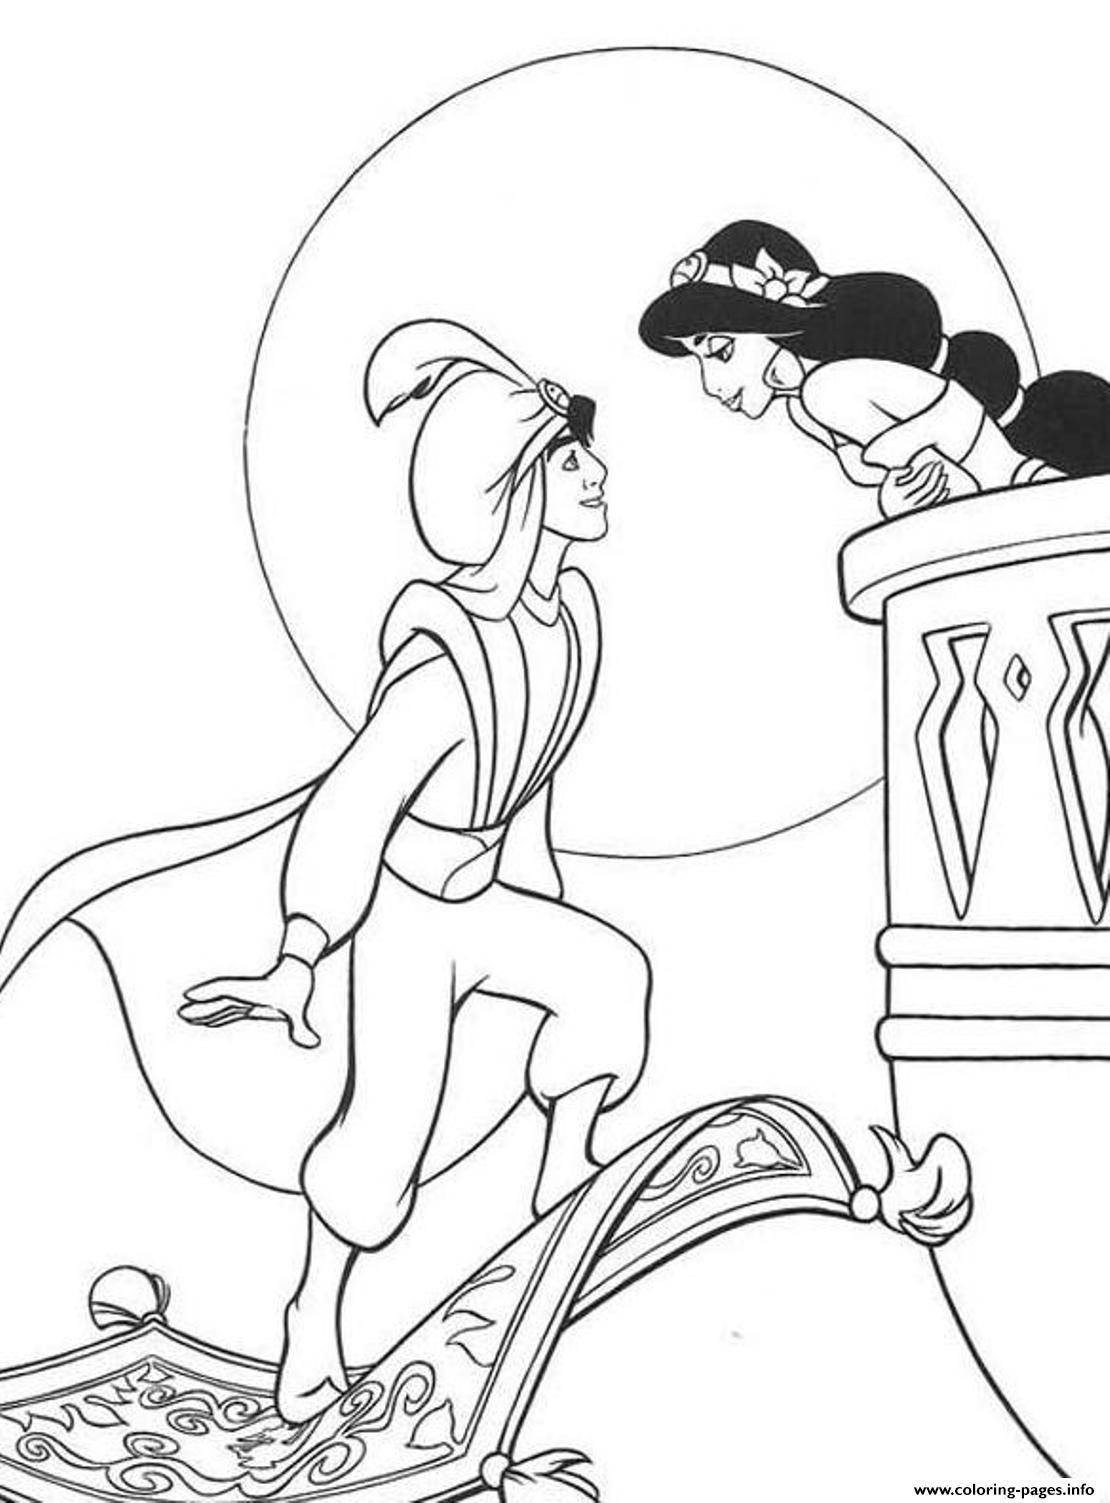 Aladdin And Jasmine Disney Coloring Sheets Disney Princess Coloring Pages Princess Coloring Pages